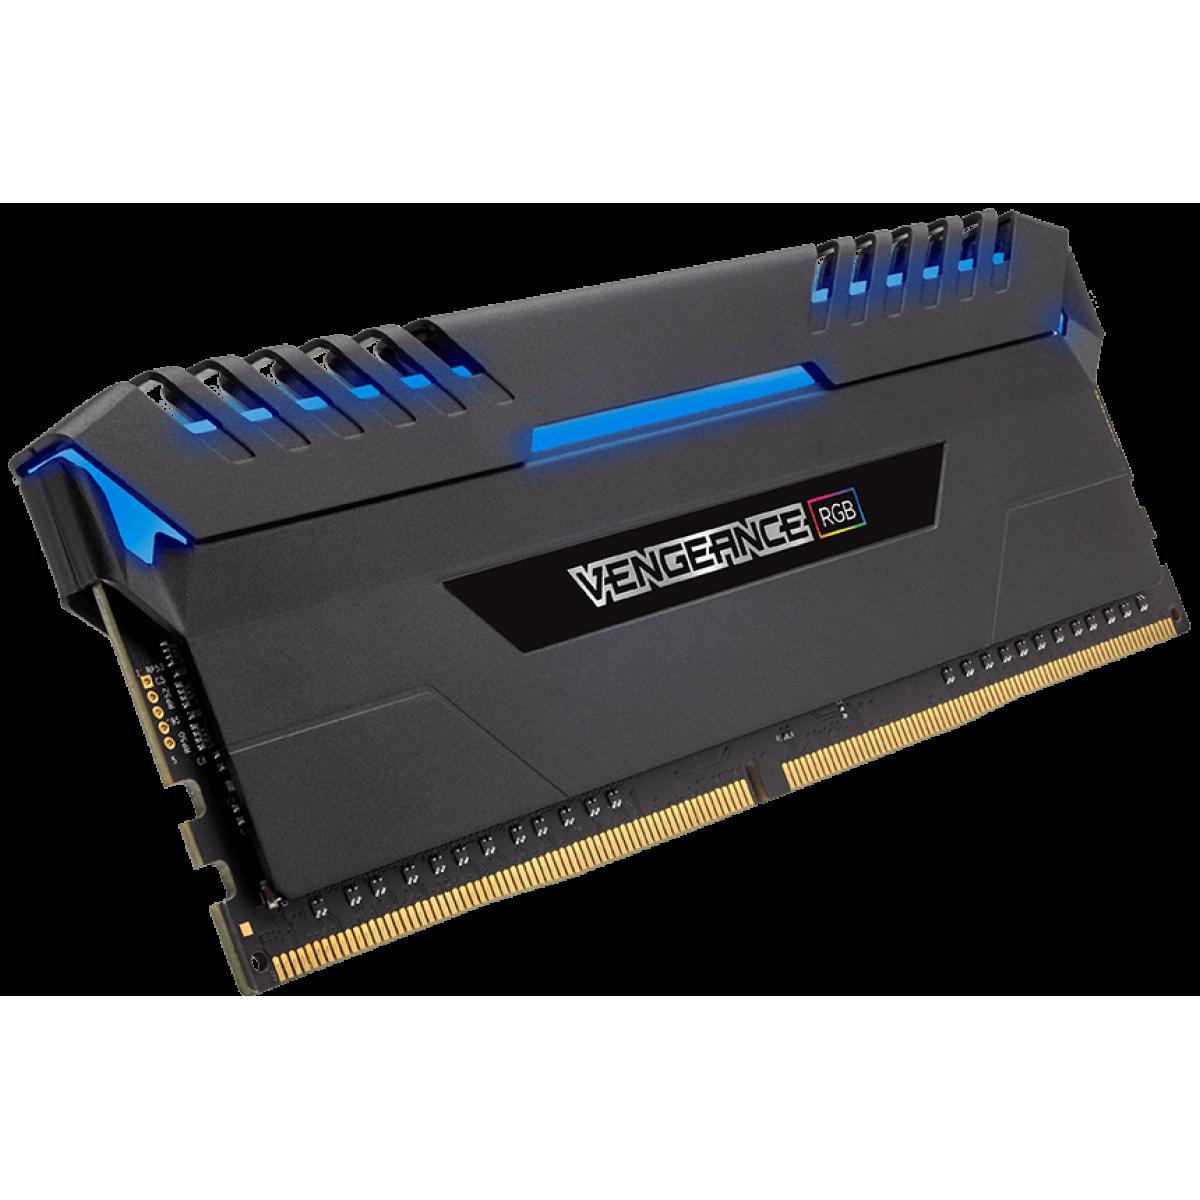 Memória DDR4 Corsair Vengeance RGB, 16GB (2x8GB) 2666MHz, CMR16GX4M2A2666C16